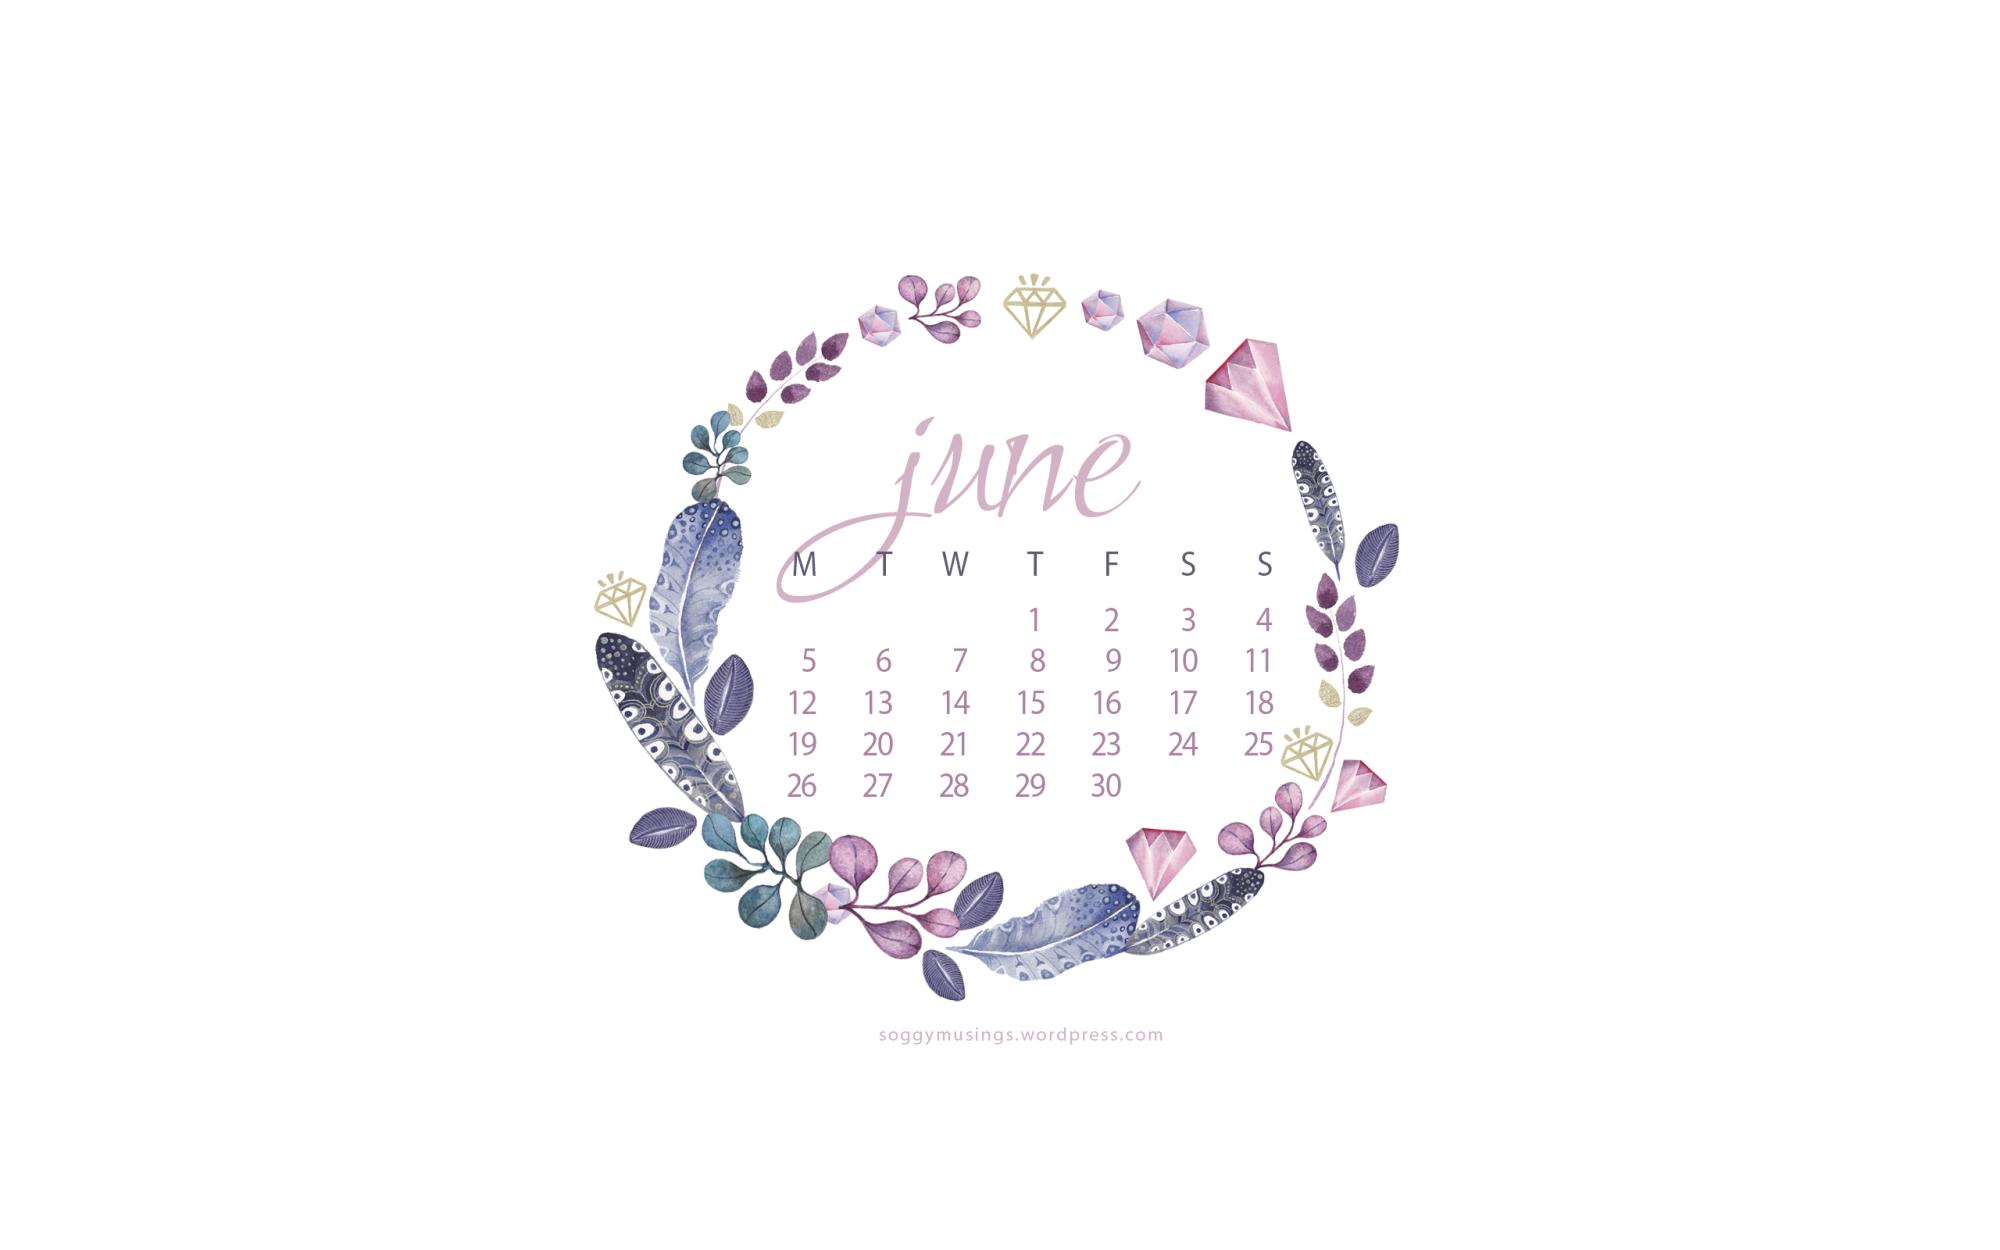 June 2017 for desktop